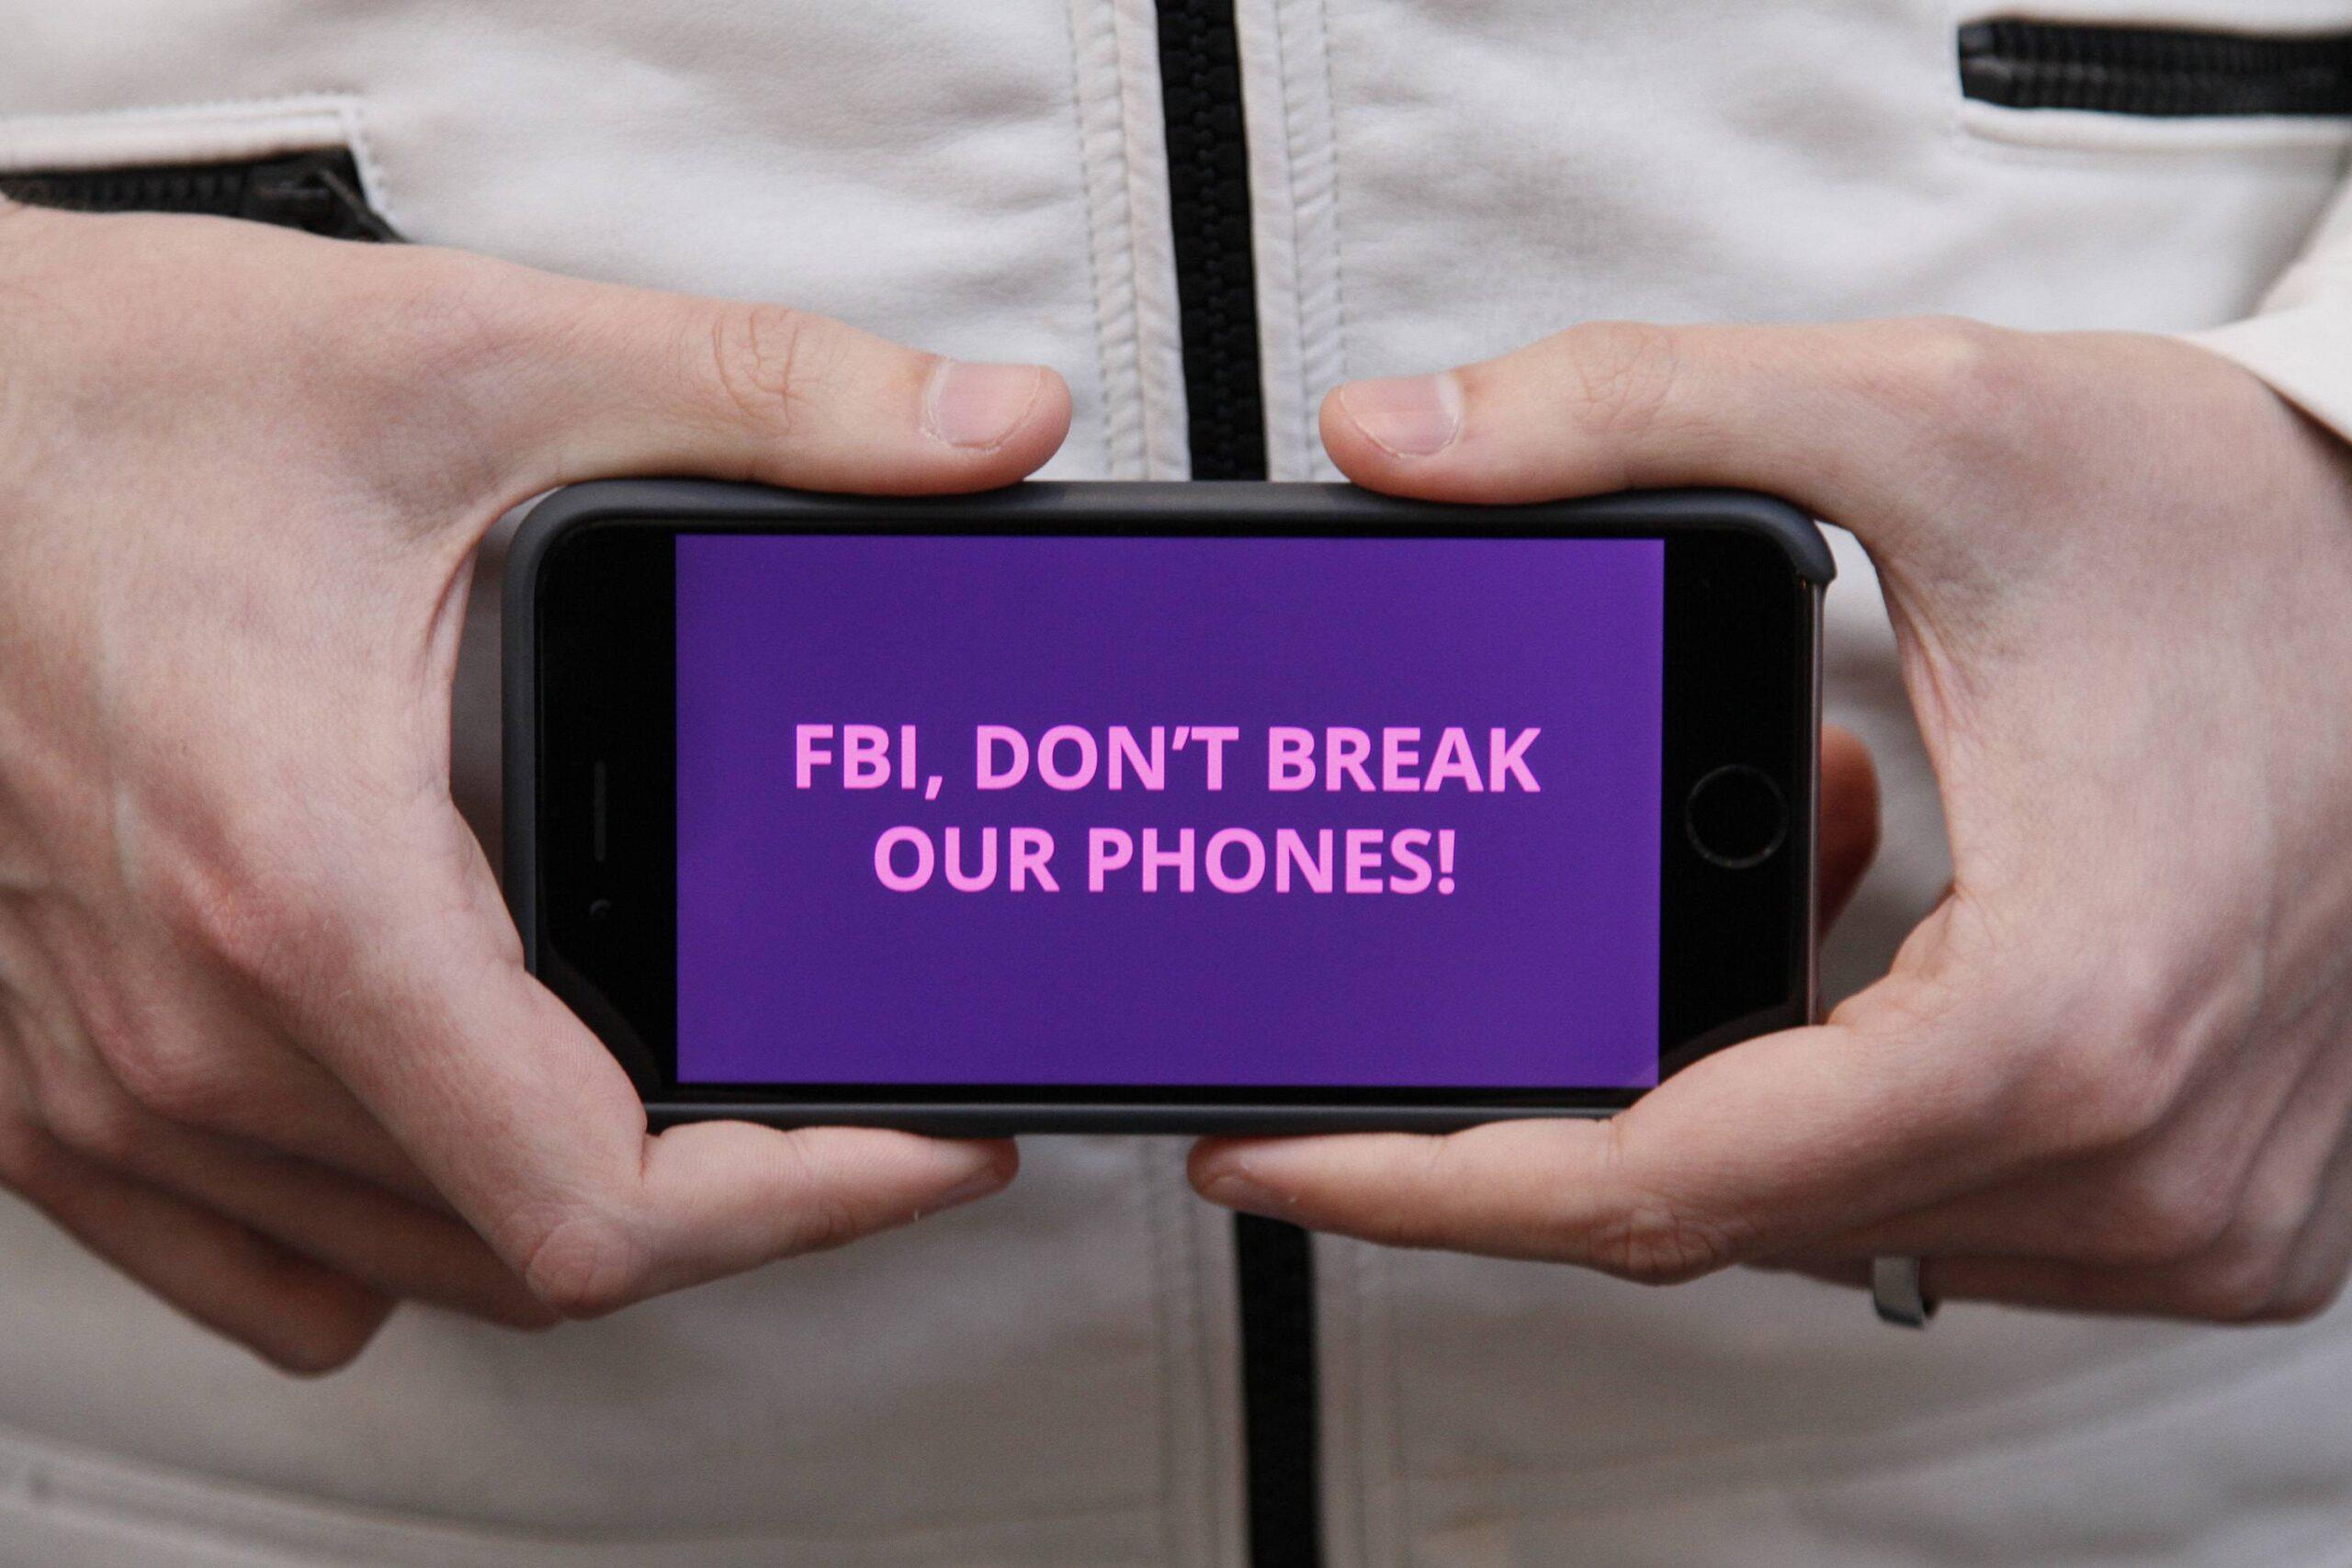 Alerta contra o FBI no iPhone